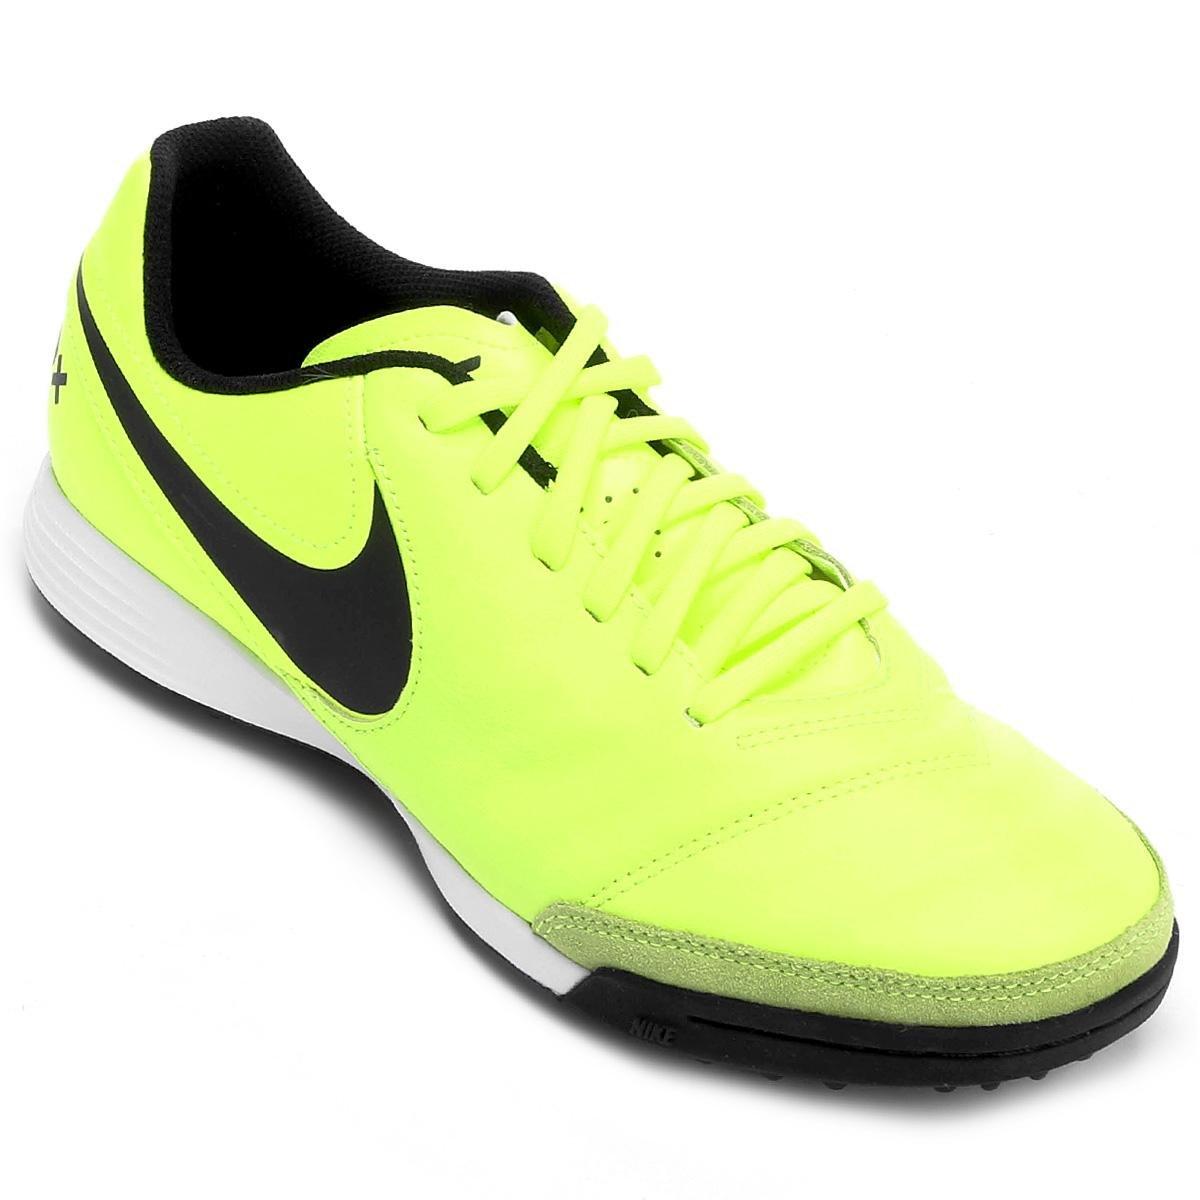 8487d82485361 Chuteira Society Nike Tiempo Genio 2 Leather TF - Verde claro - Compre  Agora